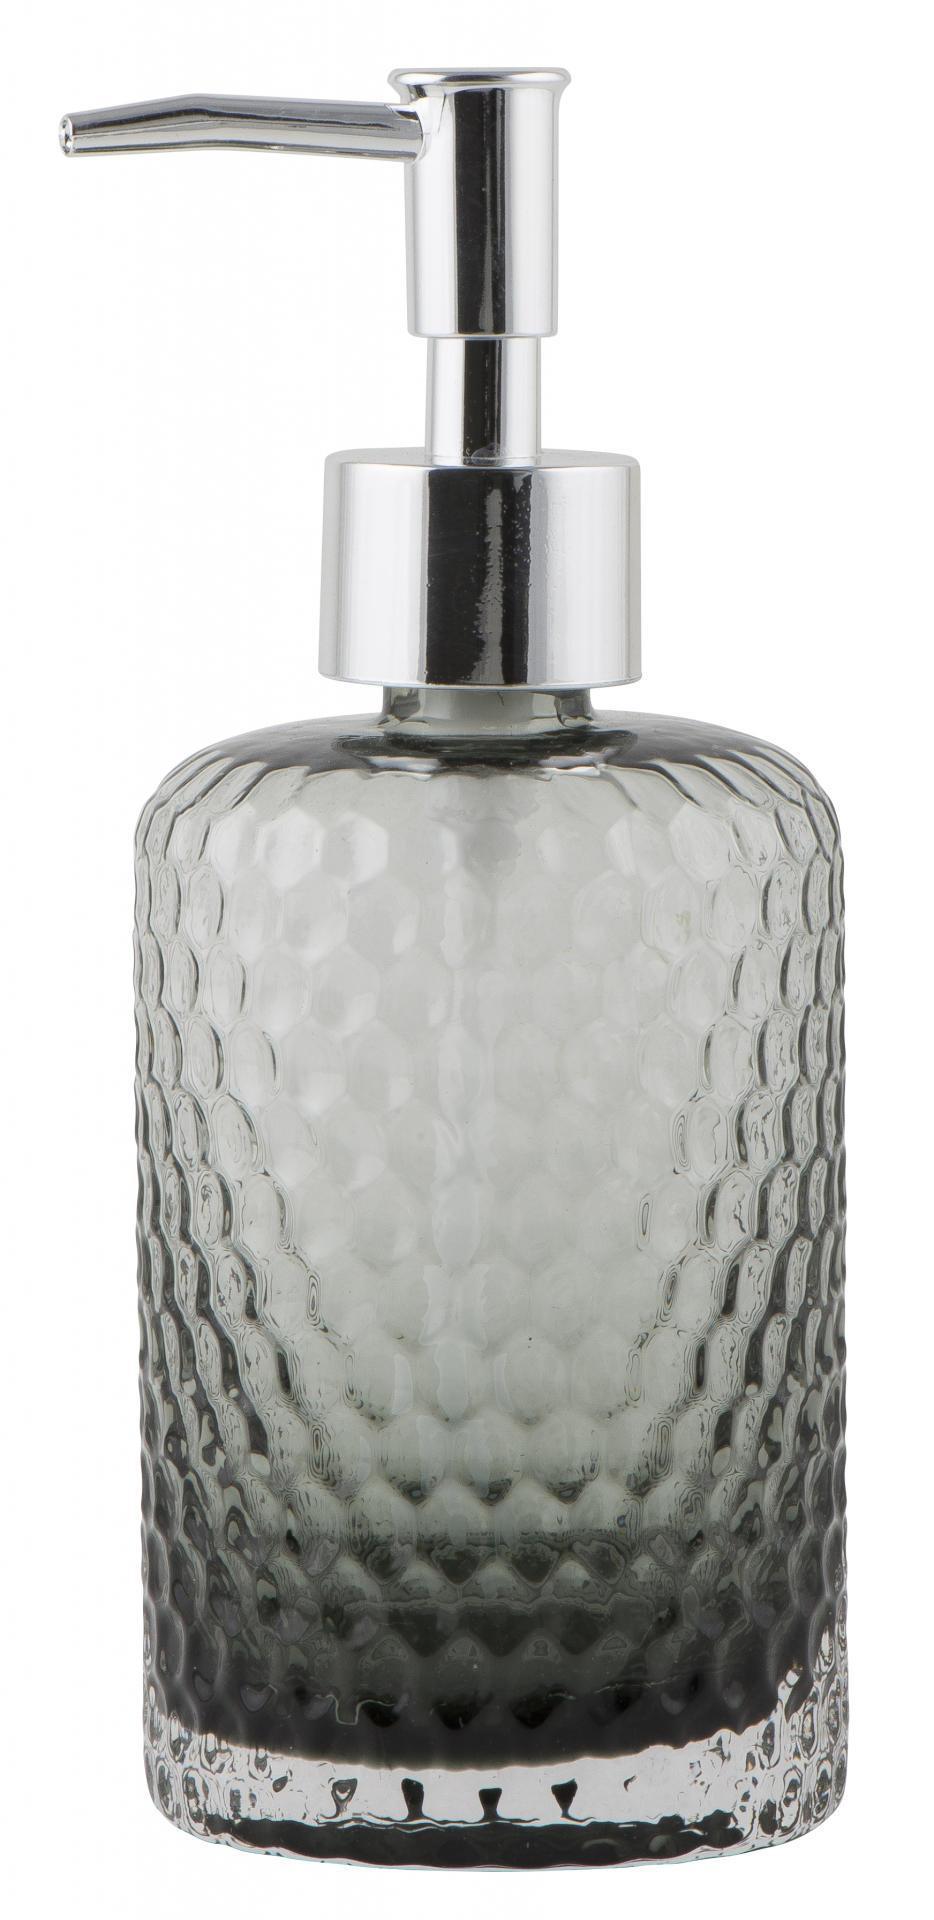 IB LAURSEN Zásobník na mýdlo Grey glass, šedá barva, sklo, plast